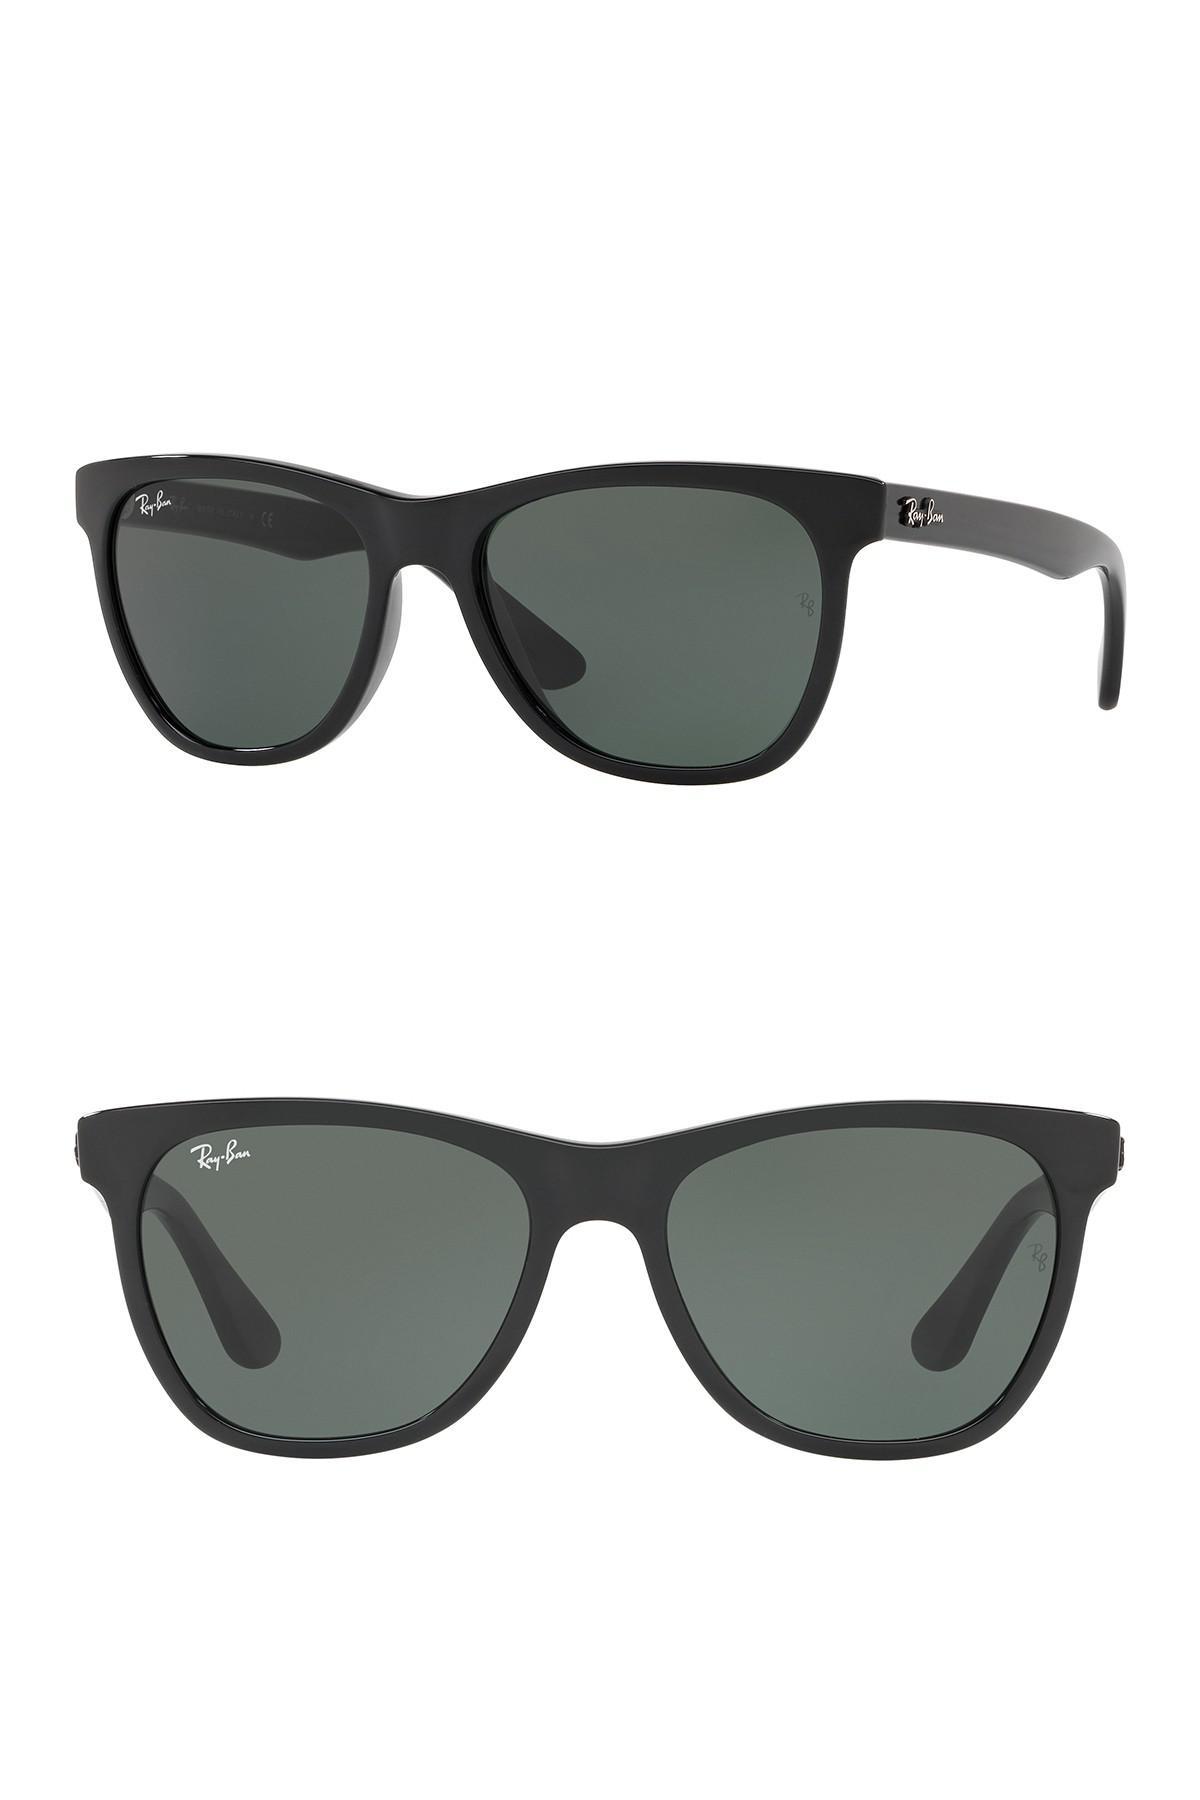 3c659d6df3 Ray-Ban 54mm Wayfarer Sunglasses in Black for Men - Lyst